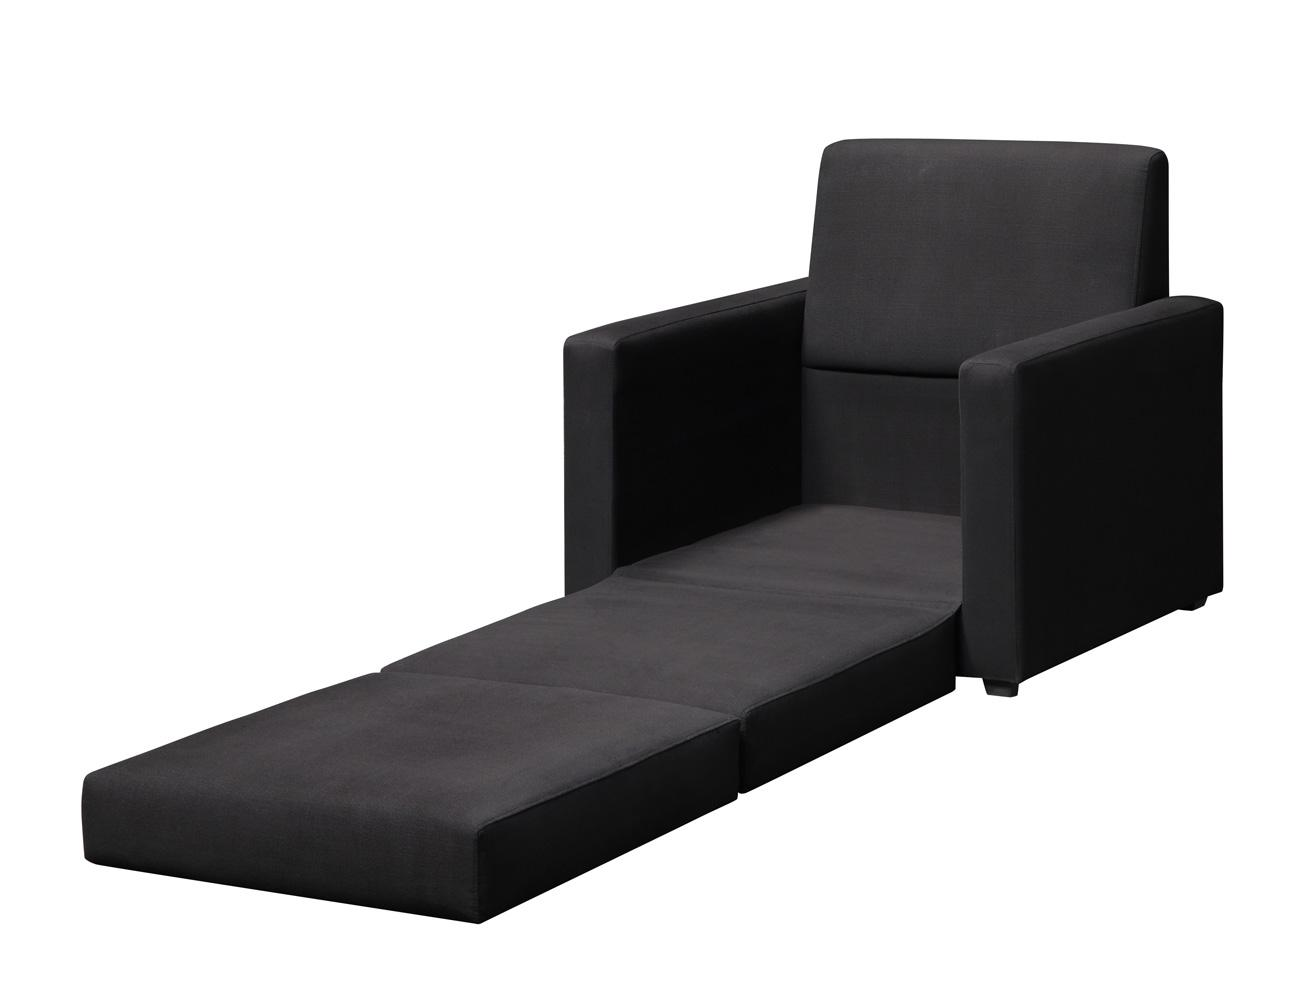 sleeper chair amazon uk christmas covers single chairs showcasing a cozy and enjoyable